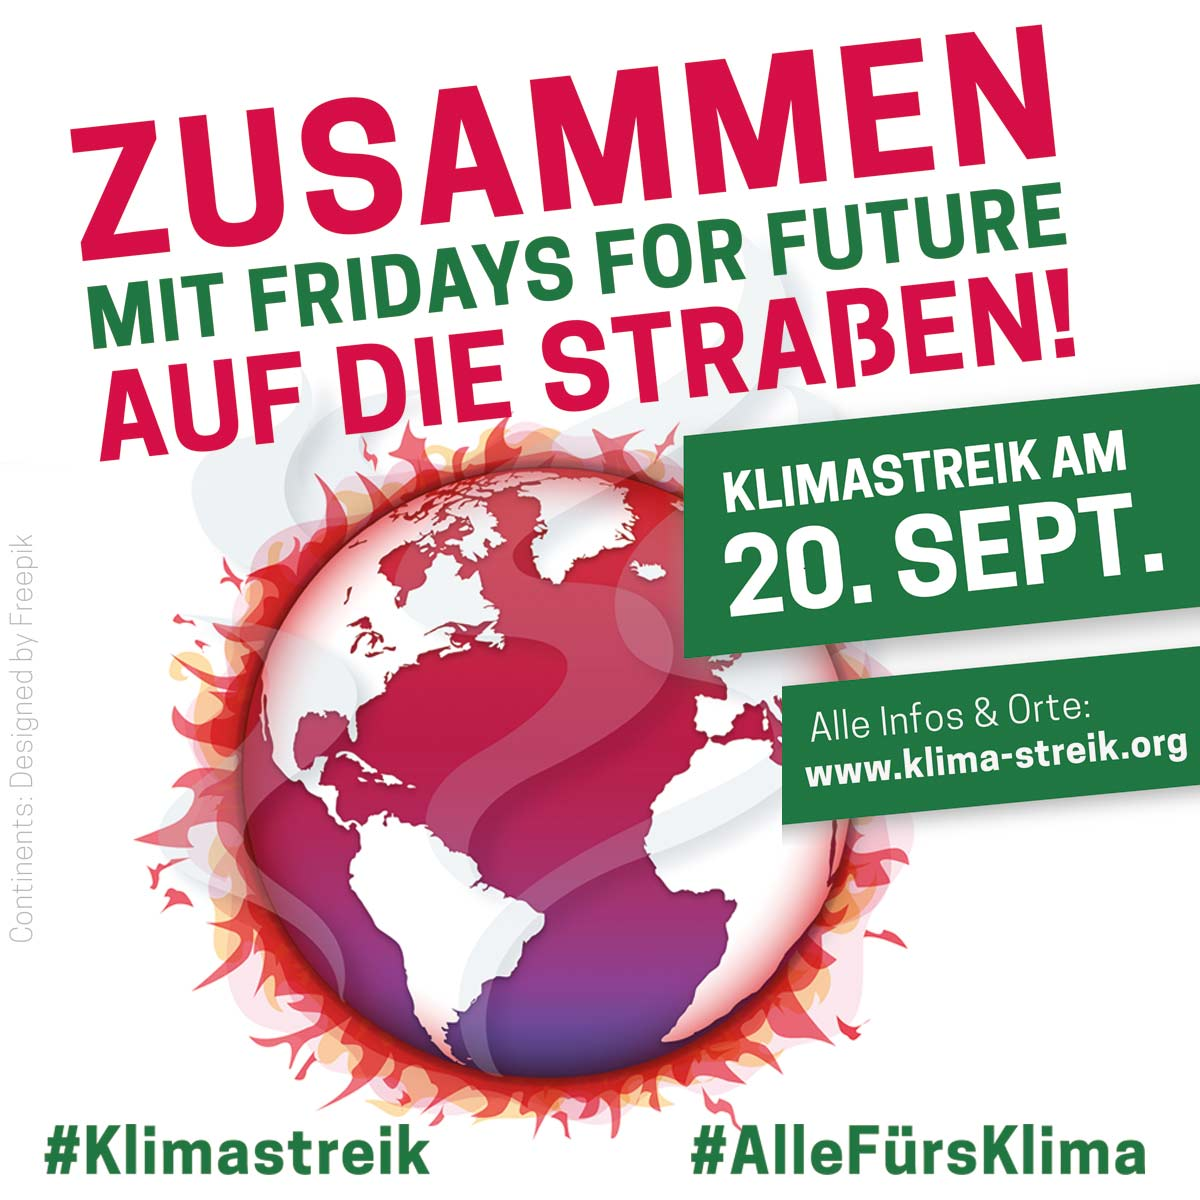 globaler Klimastreik am 20. September 2019